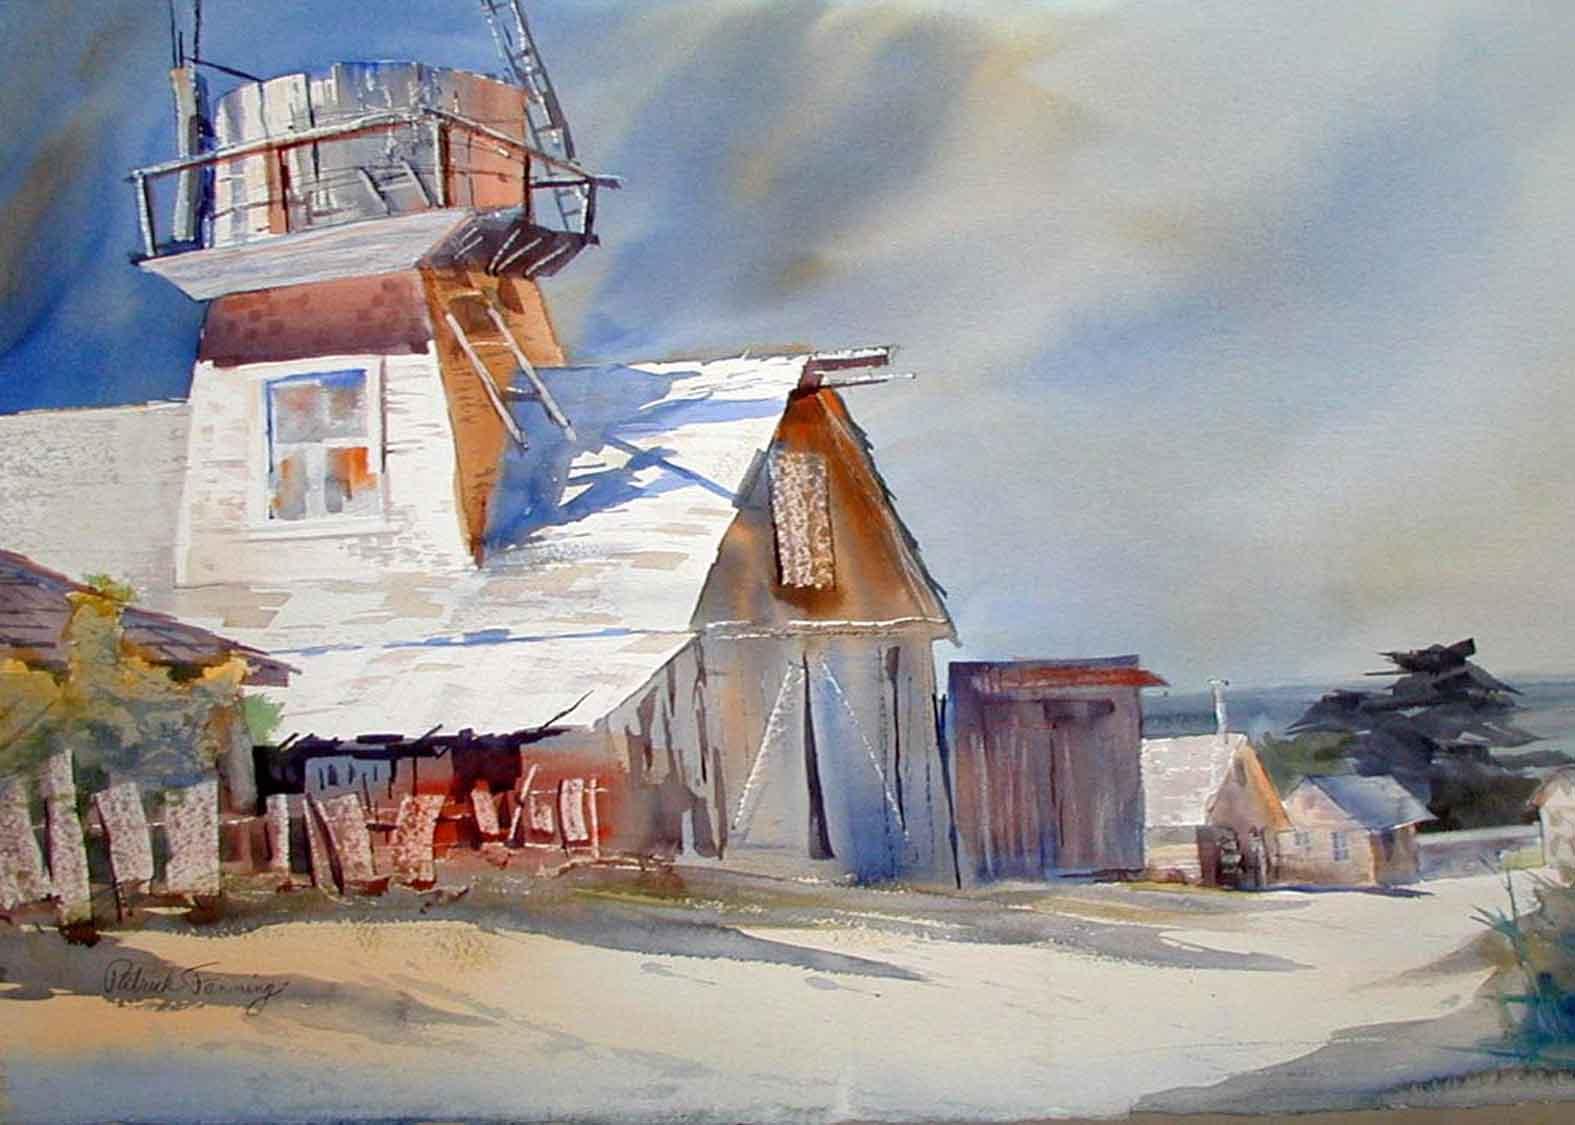 Phil's-barn